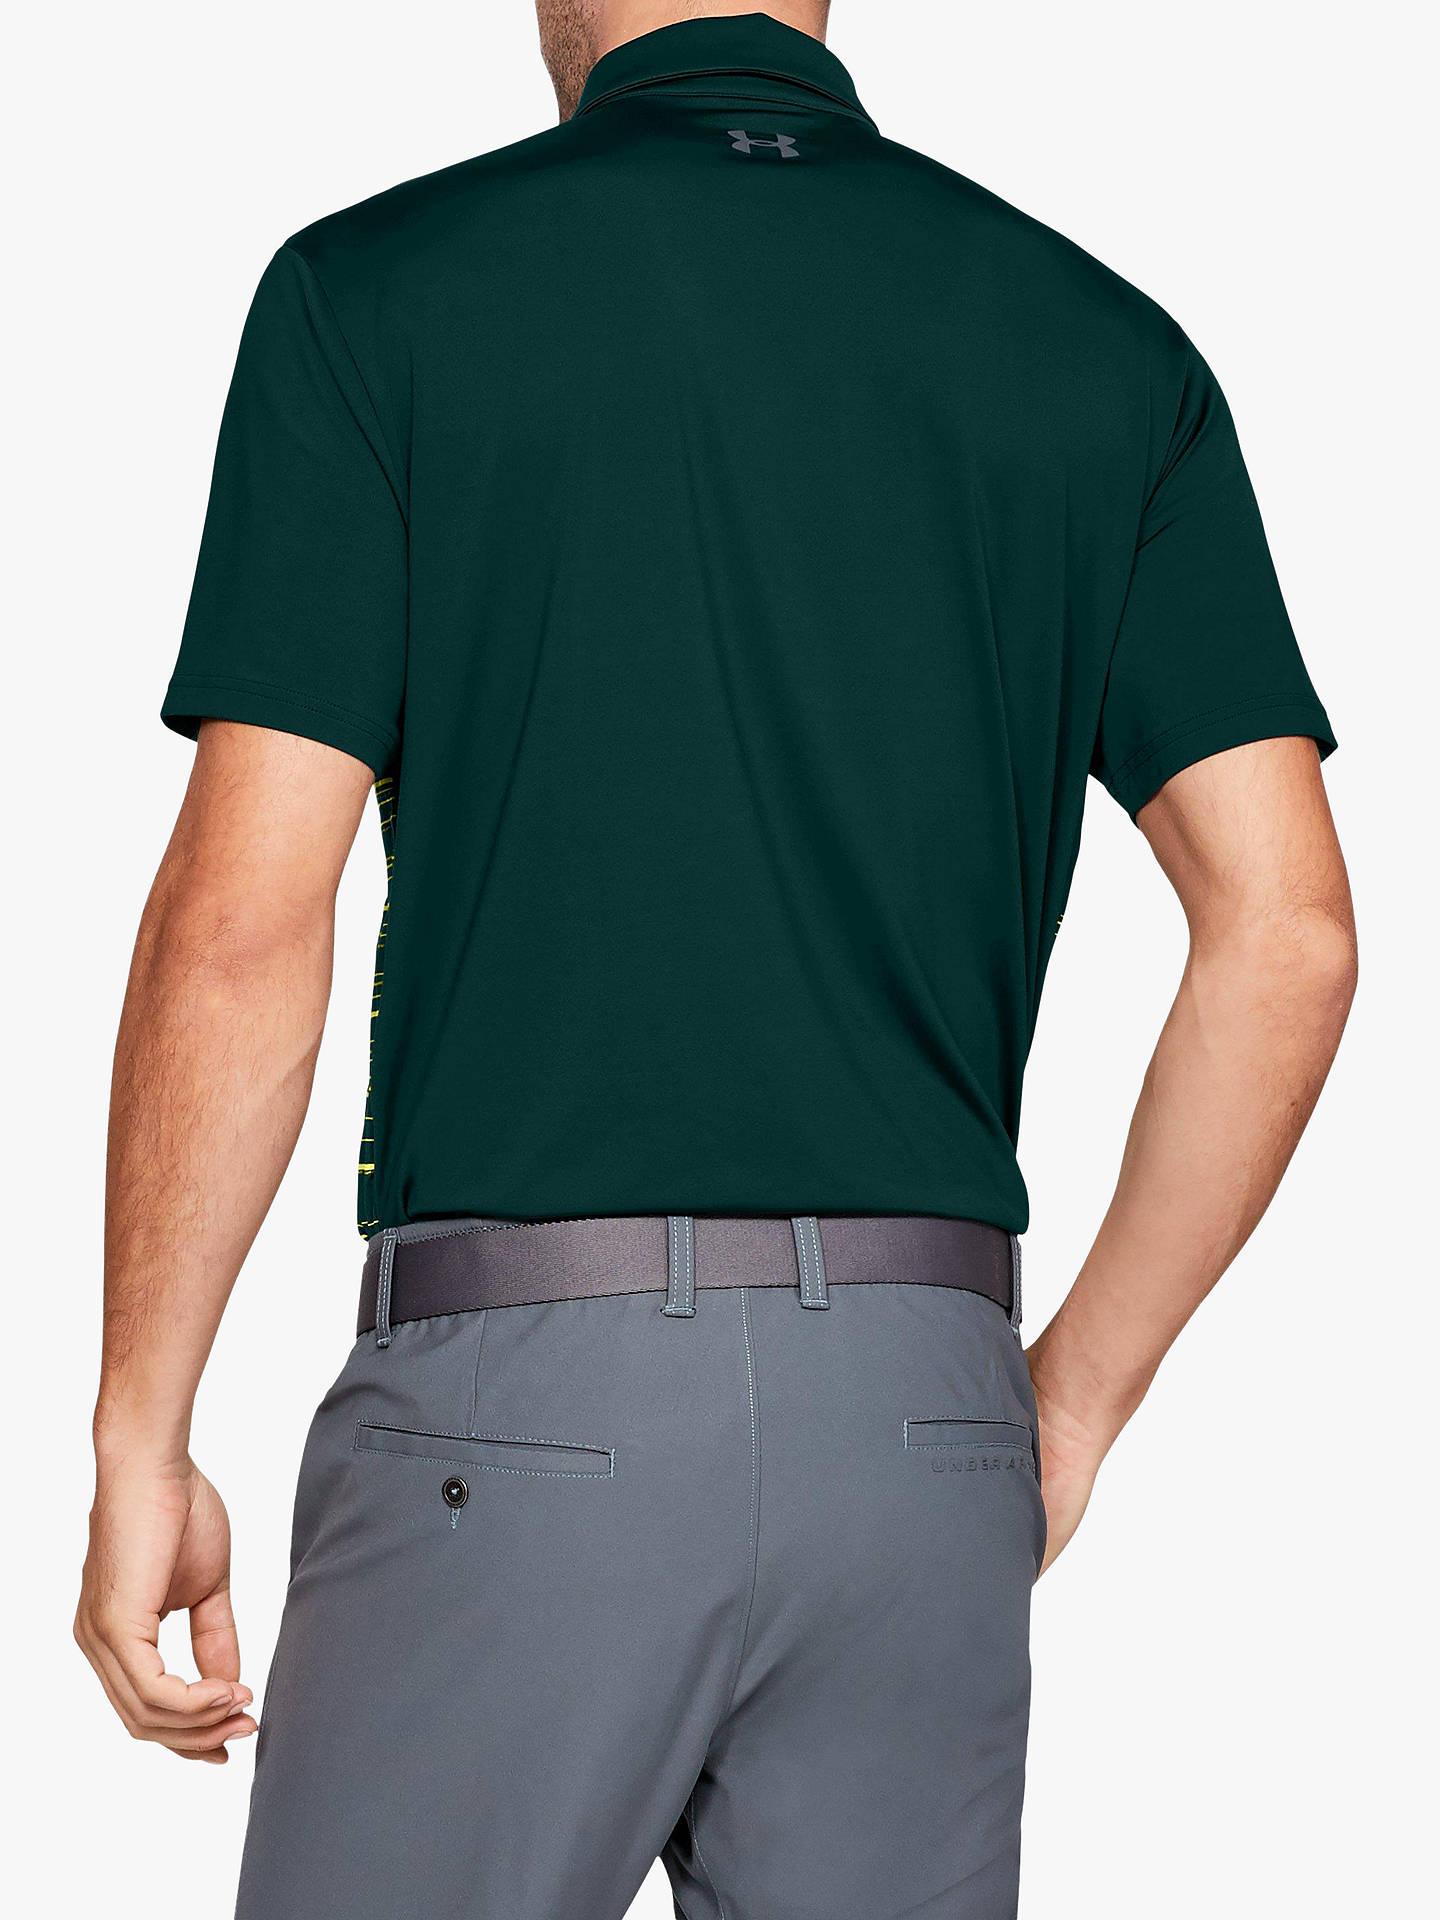 sentido común formato Abiertamente  Under Armour Playoff 2.0 Golf Polo Shirt, Green at John Lewis & Partners